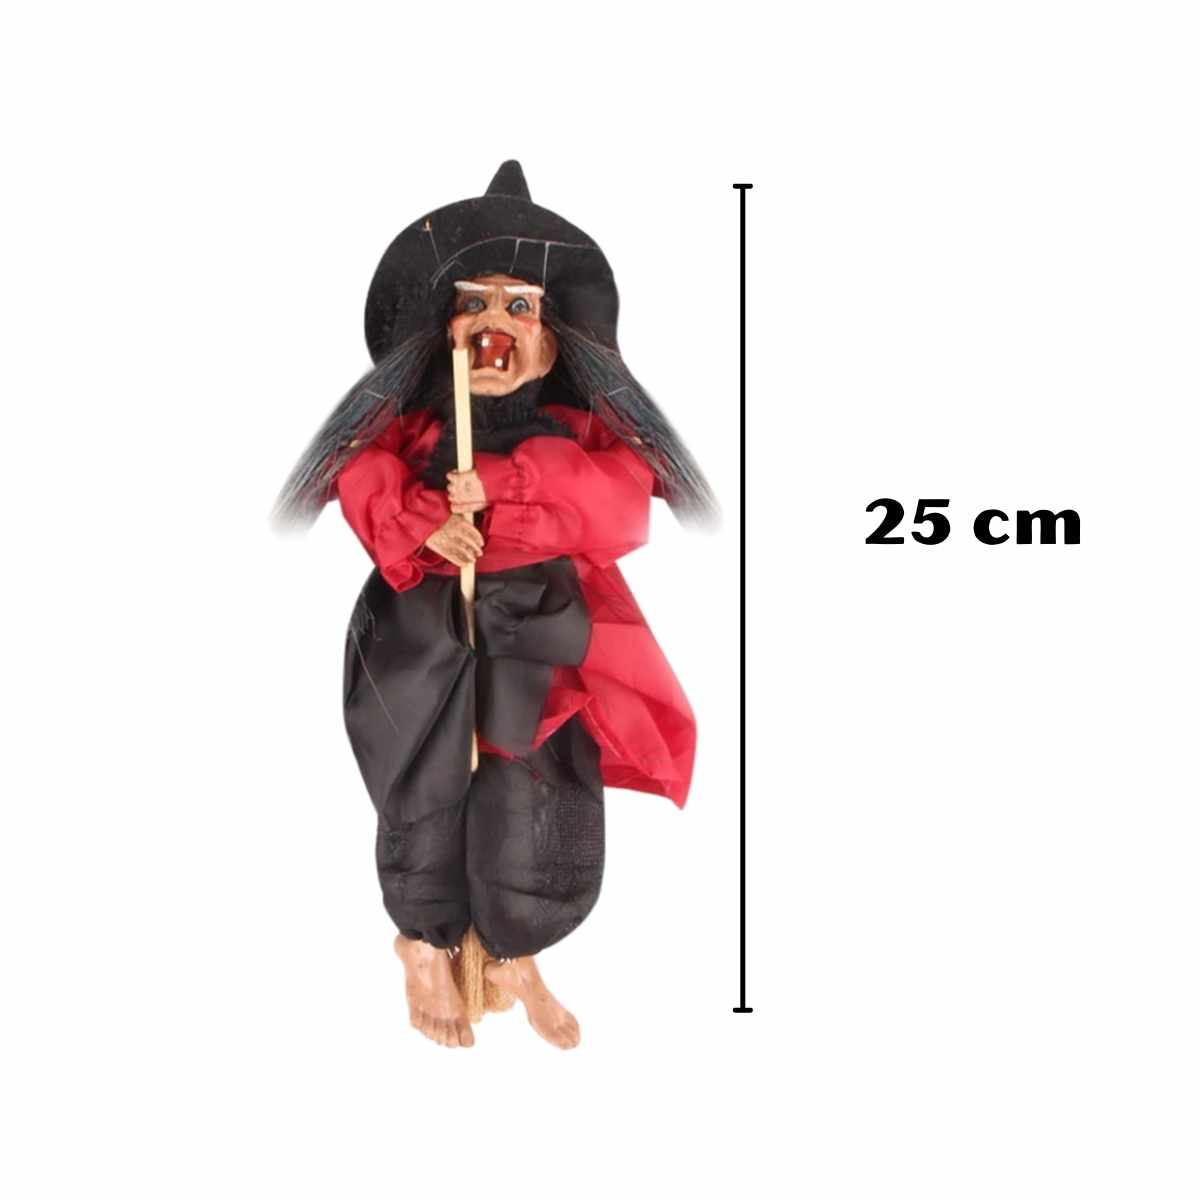 Enfeite Mini Bruxa Voando Som/Luz 25cm